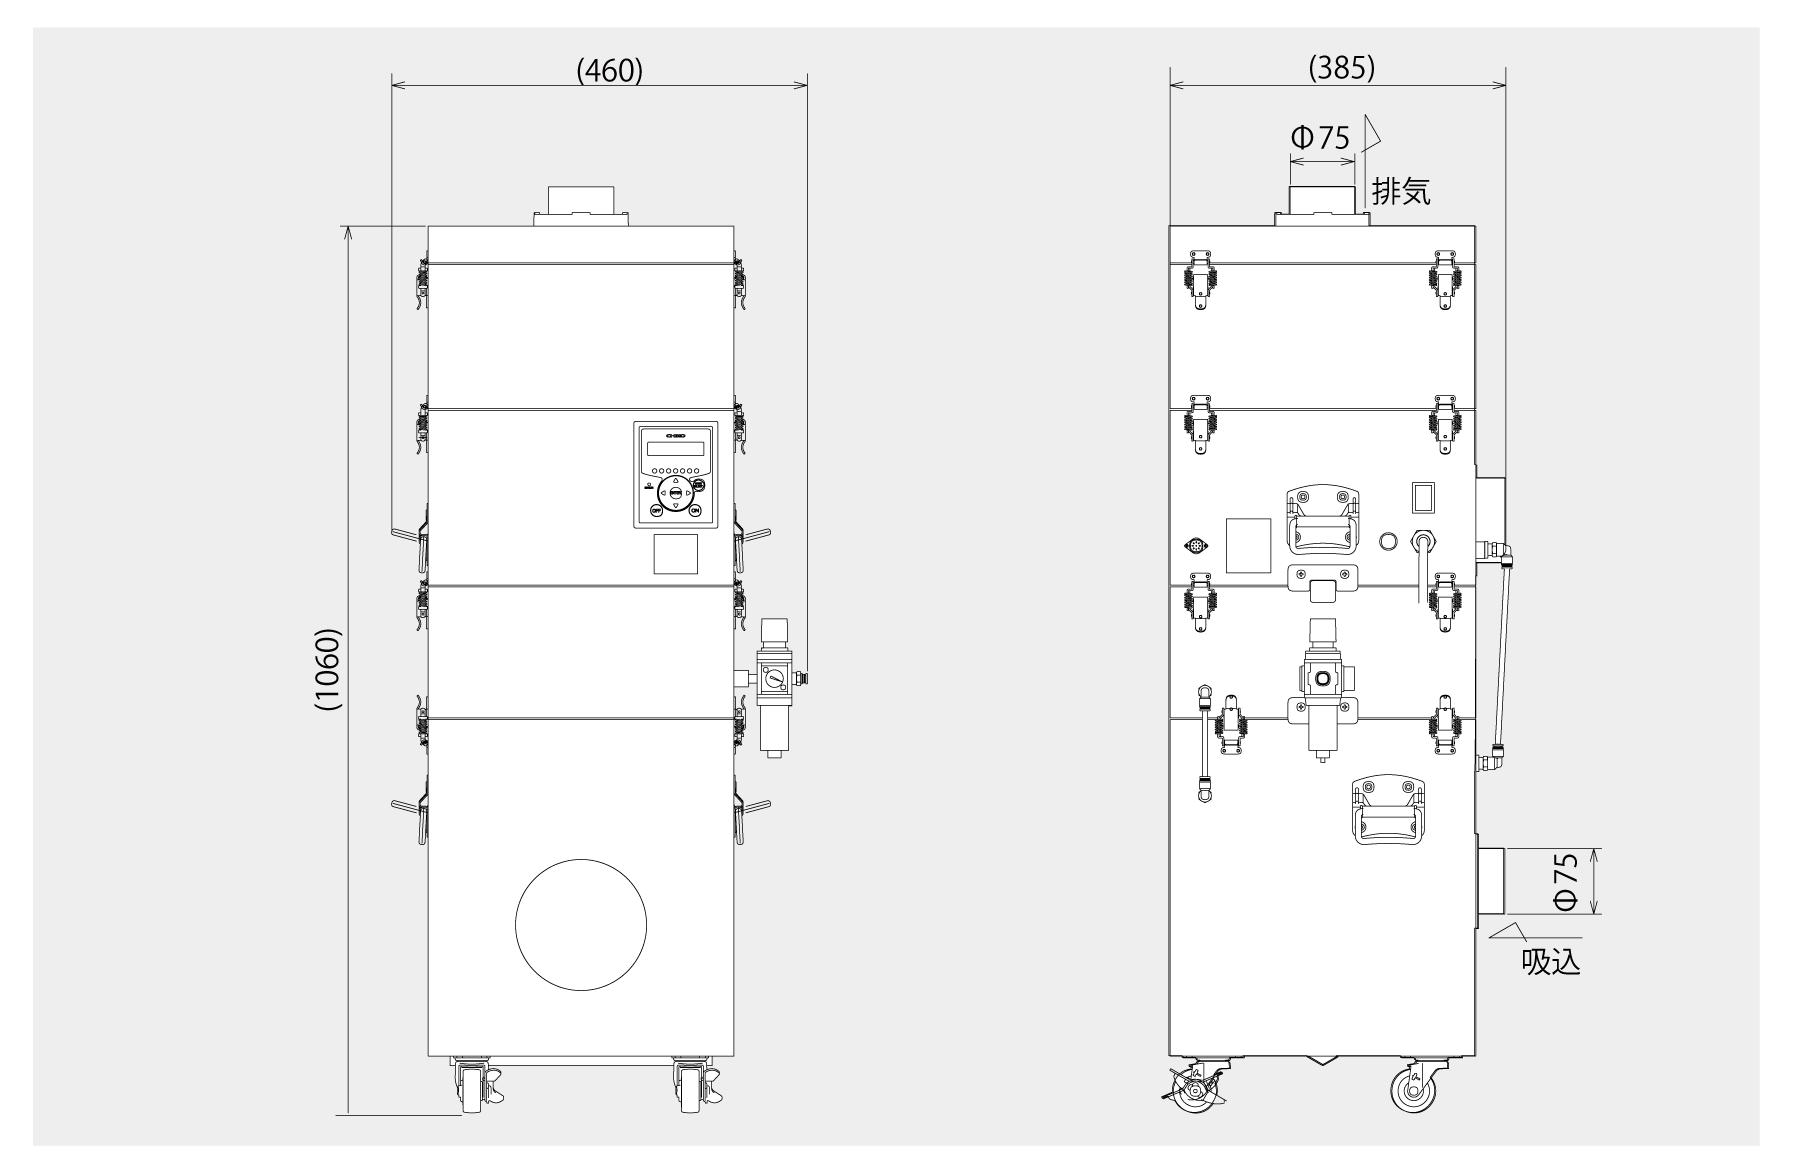 画像: CBD-1000AT3-DSA-J 外形図